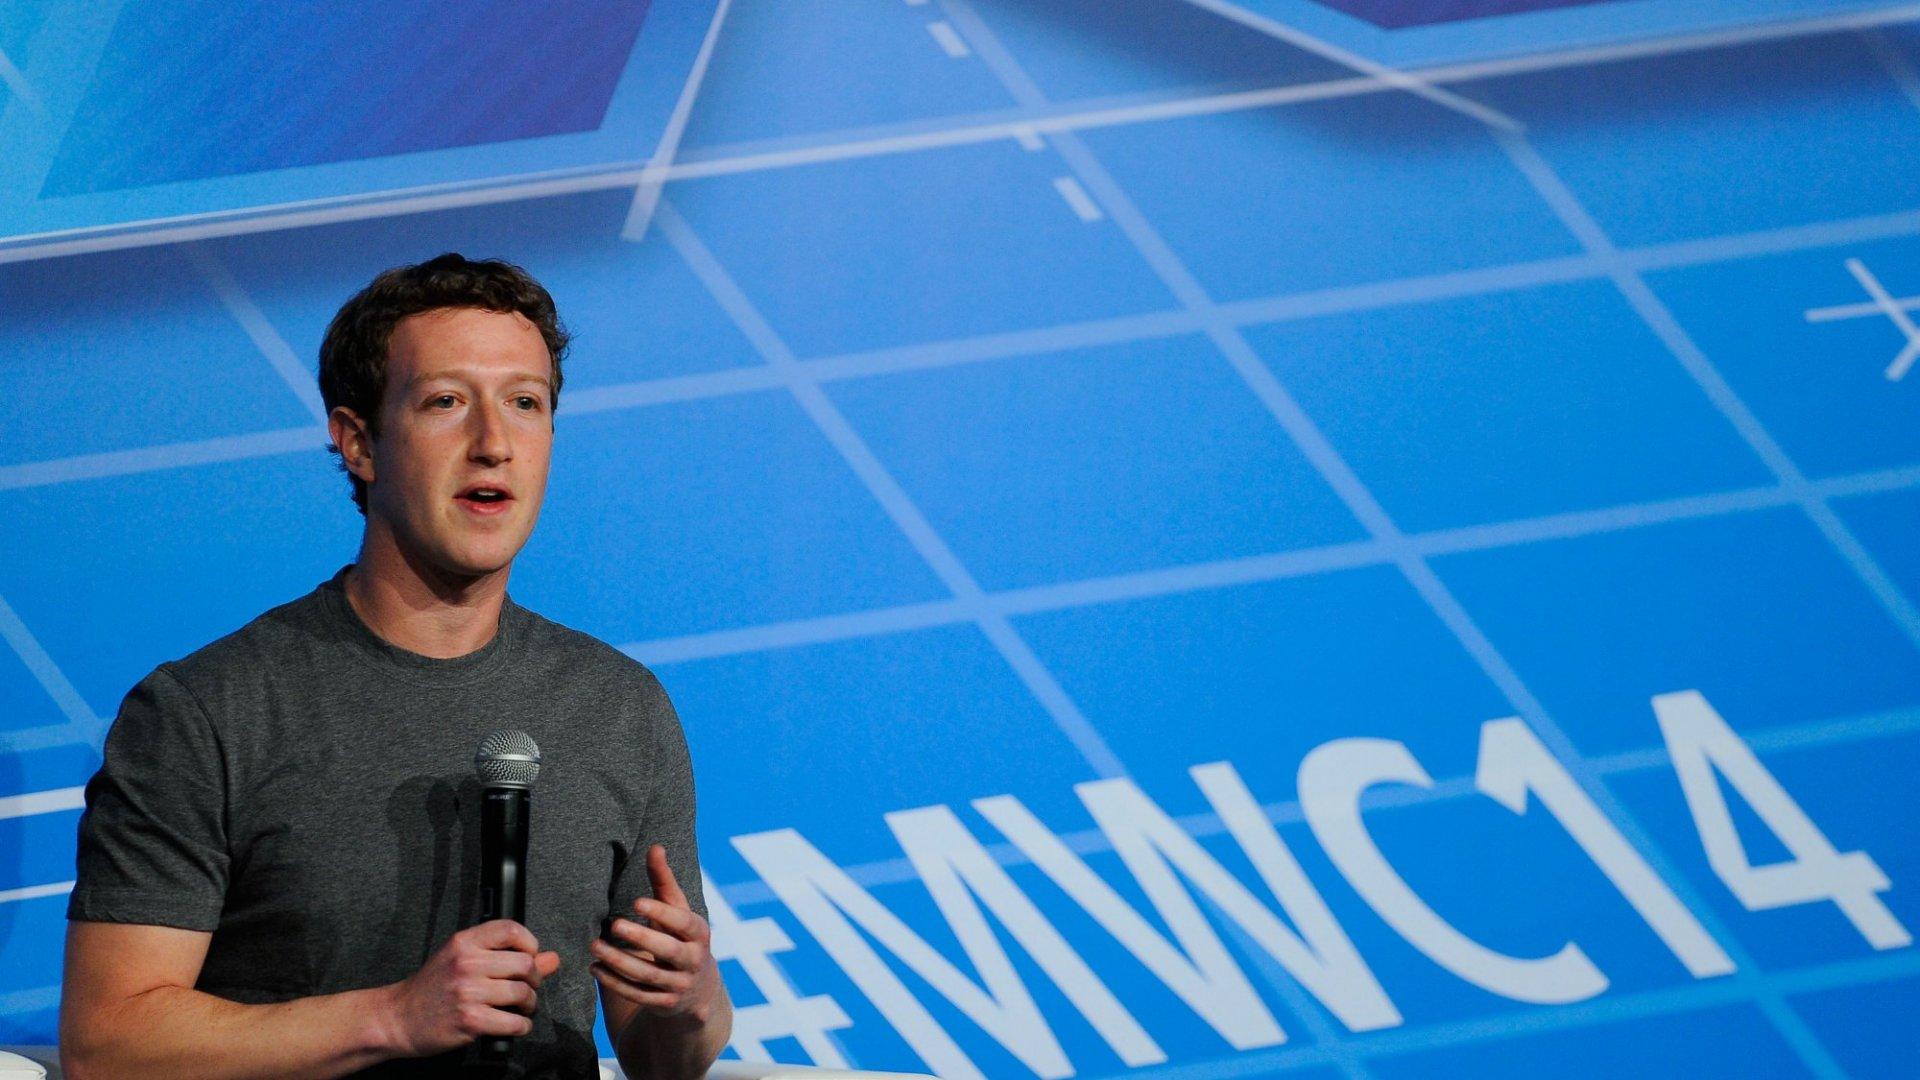 Mark ZuckerbergExplainedWhy He Thinks Breaking Up Facebook Isn't a Good Idea